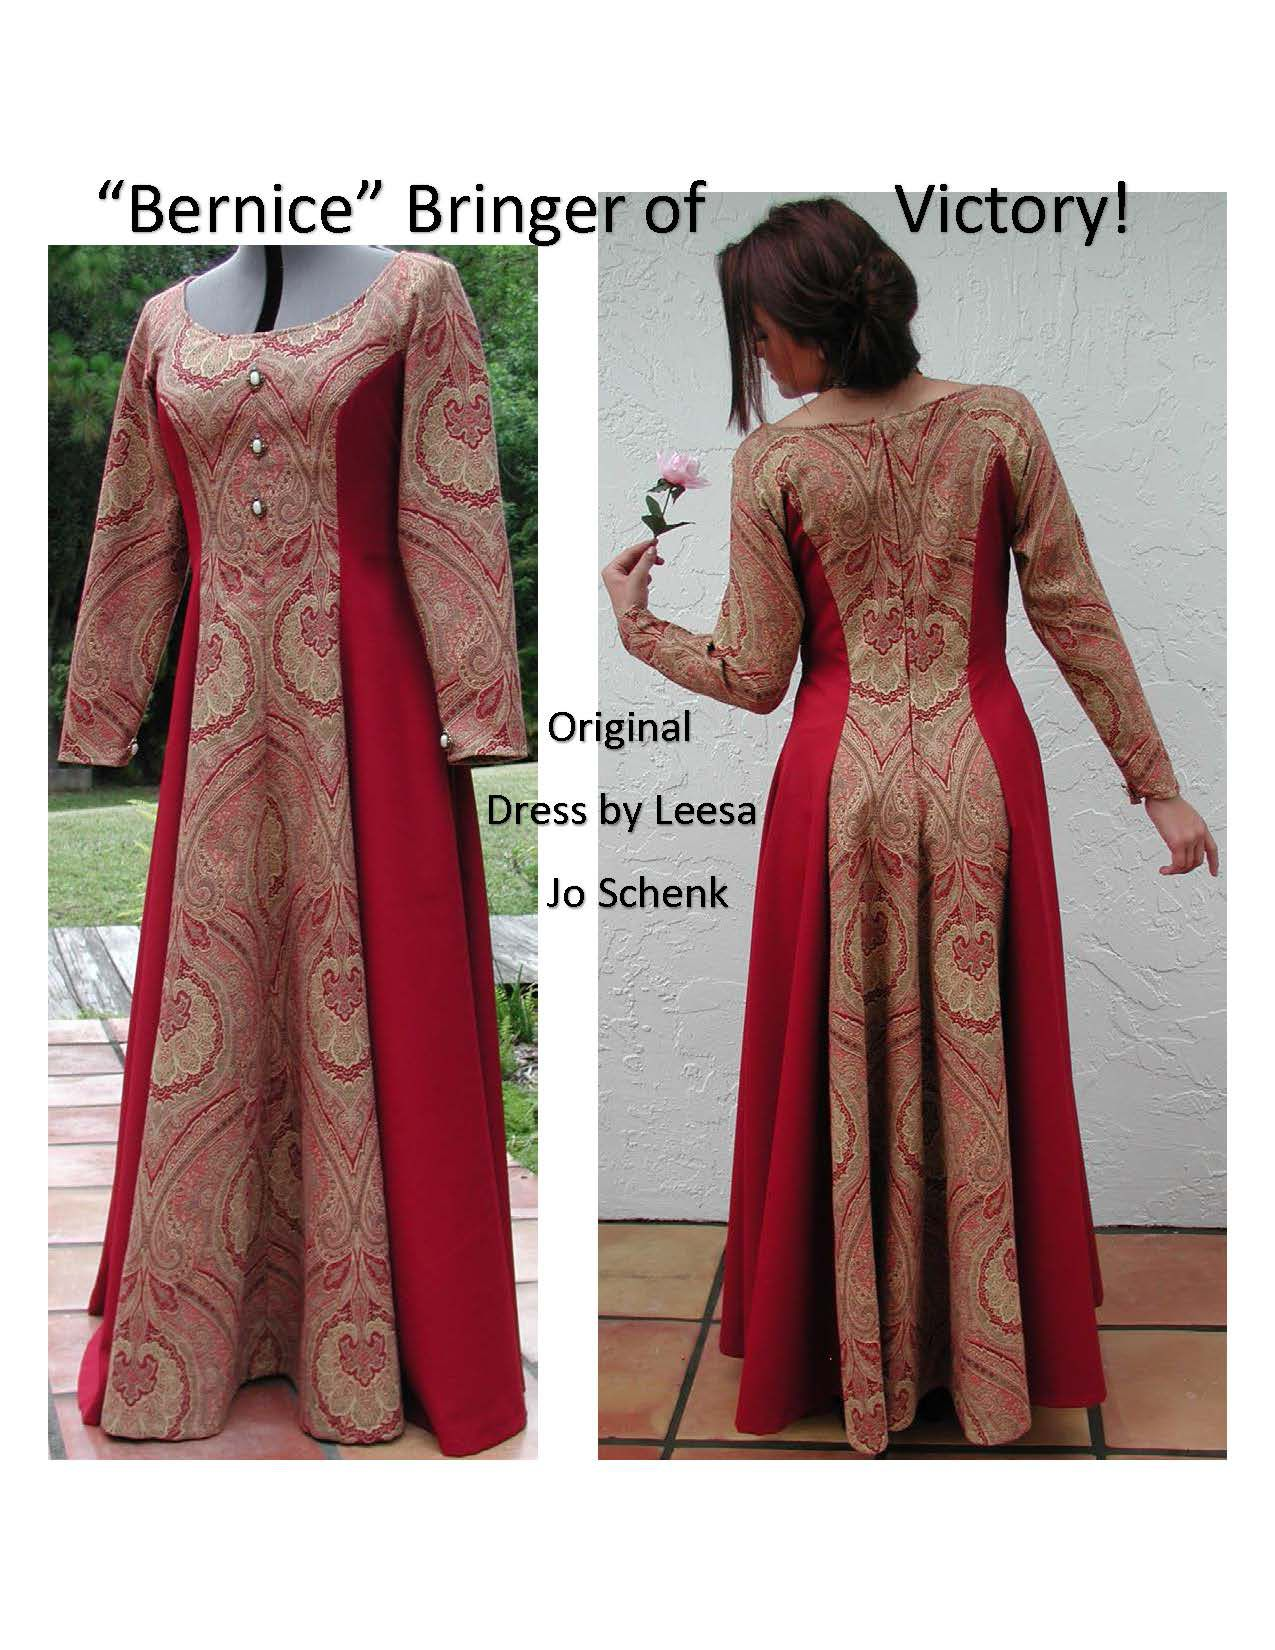 original renaissance bernice onceuponatime longdress leesajoschenk costume handmade red gown